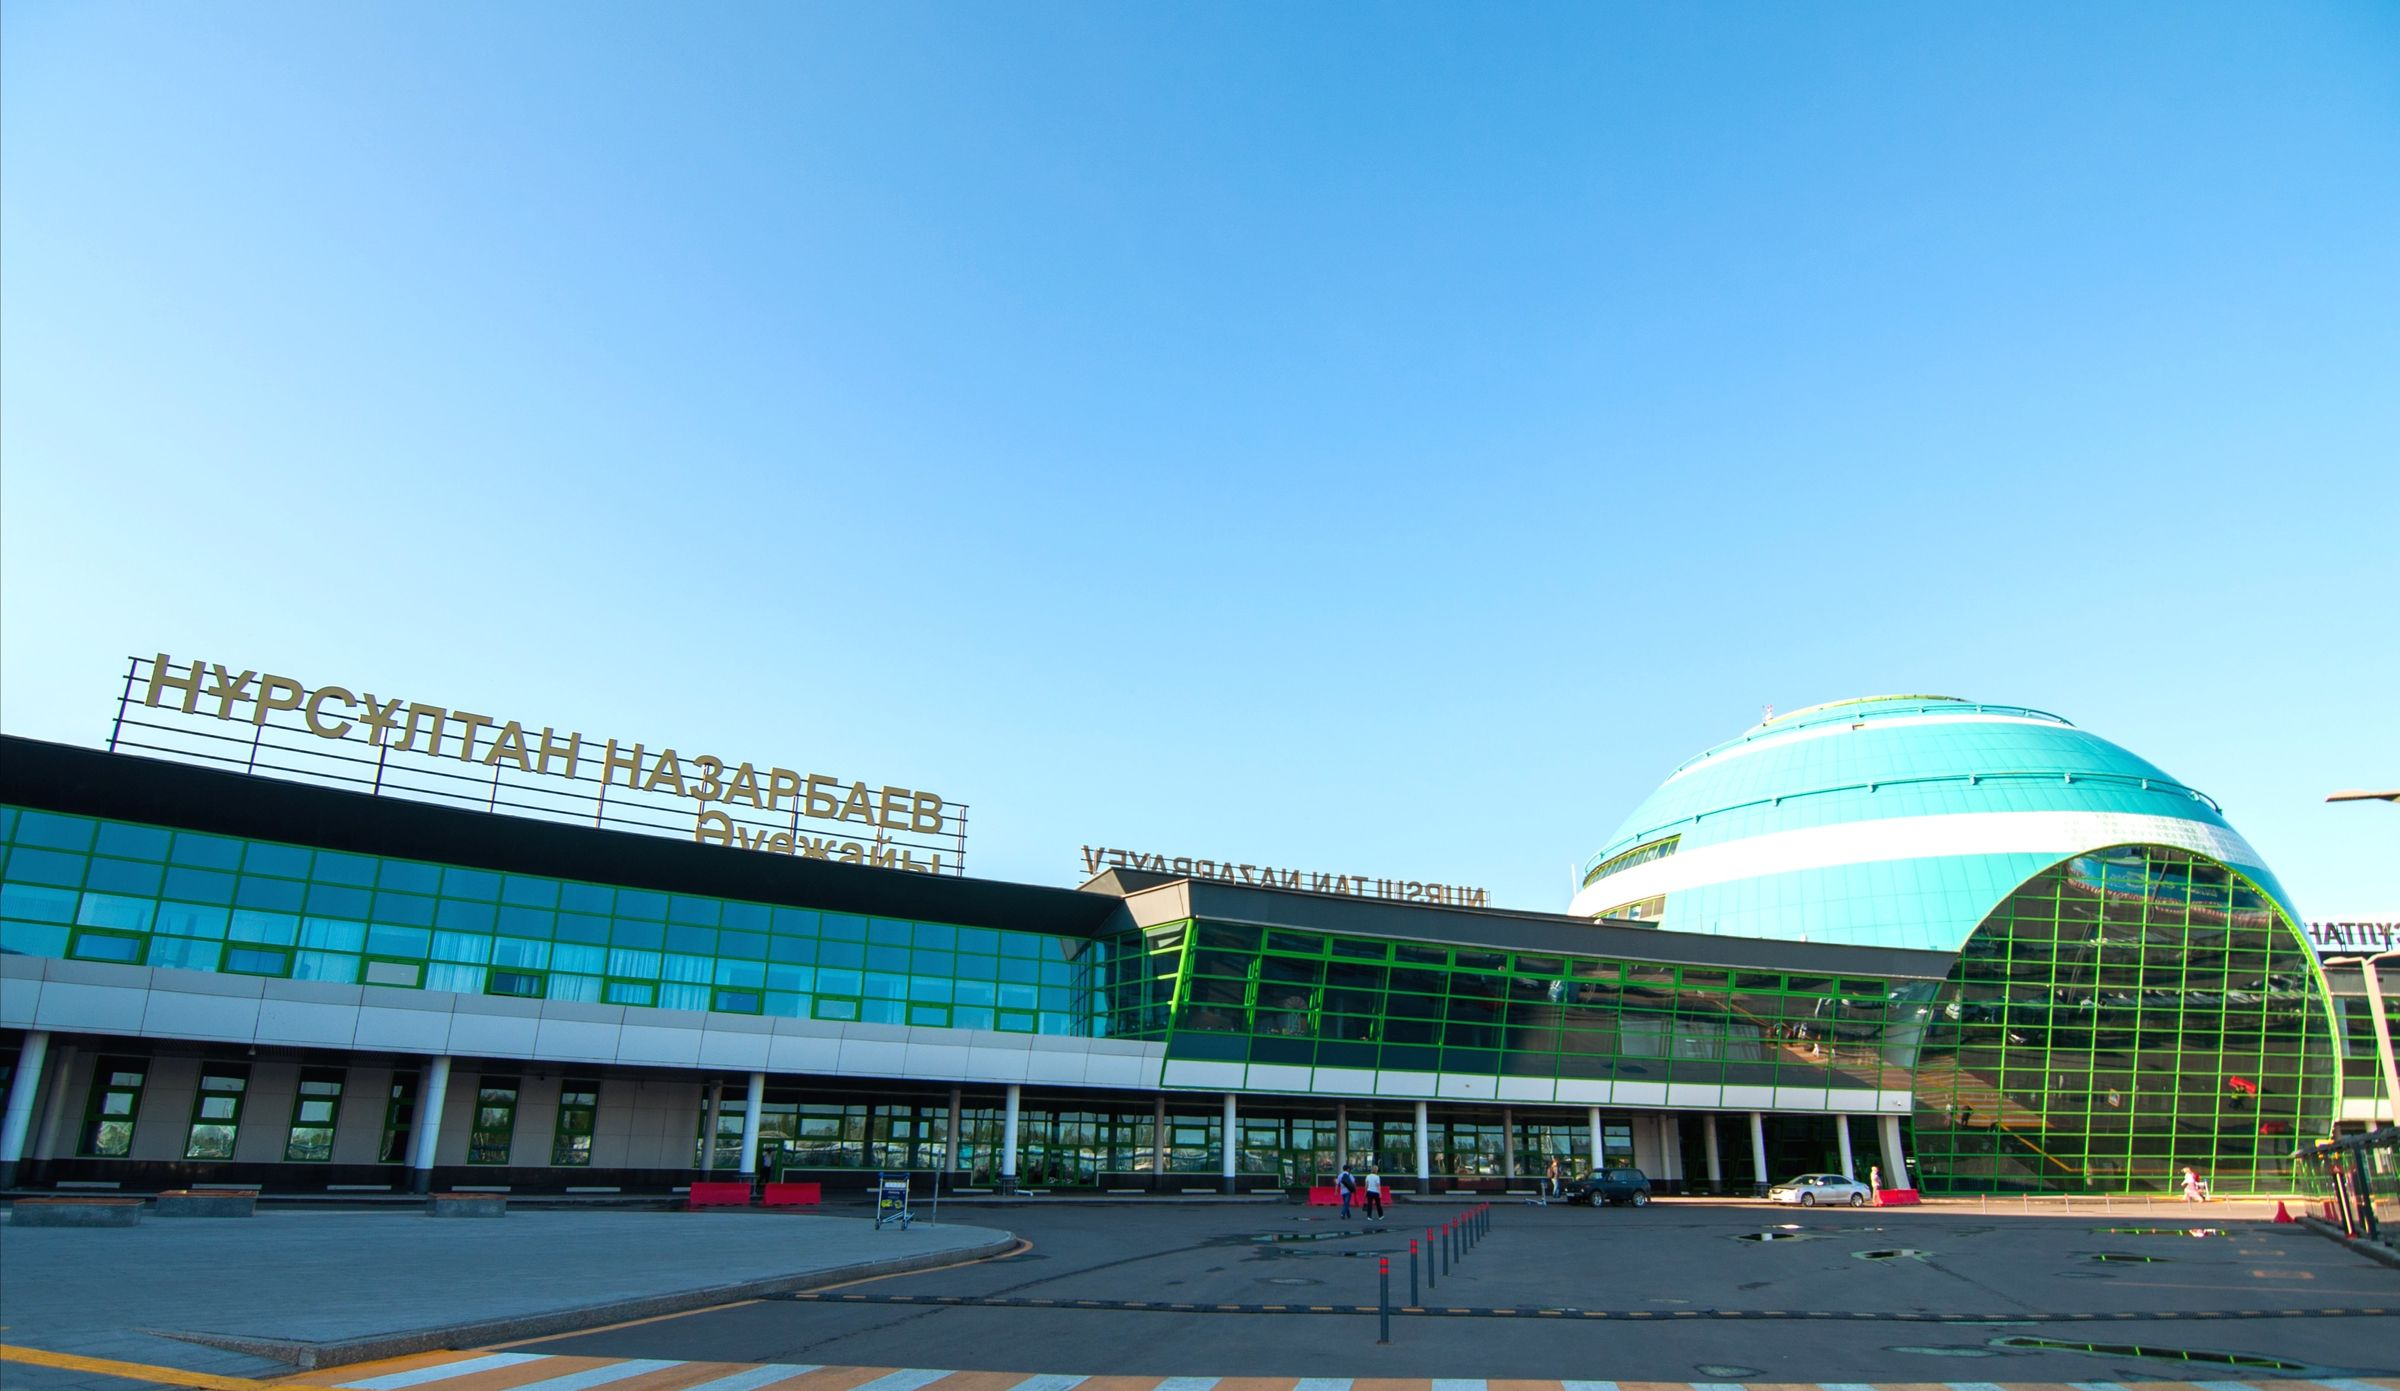 <p>Фото с официального сайта международного аэропорта Нурсултан Назарбаев </p>